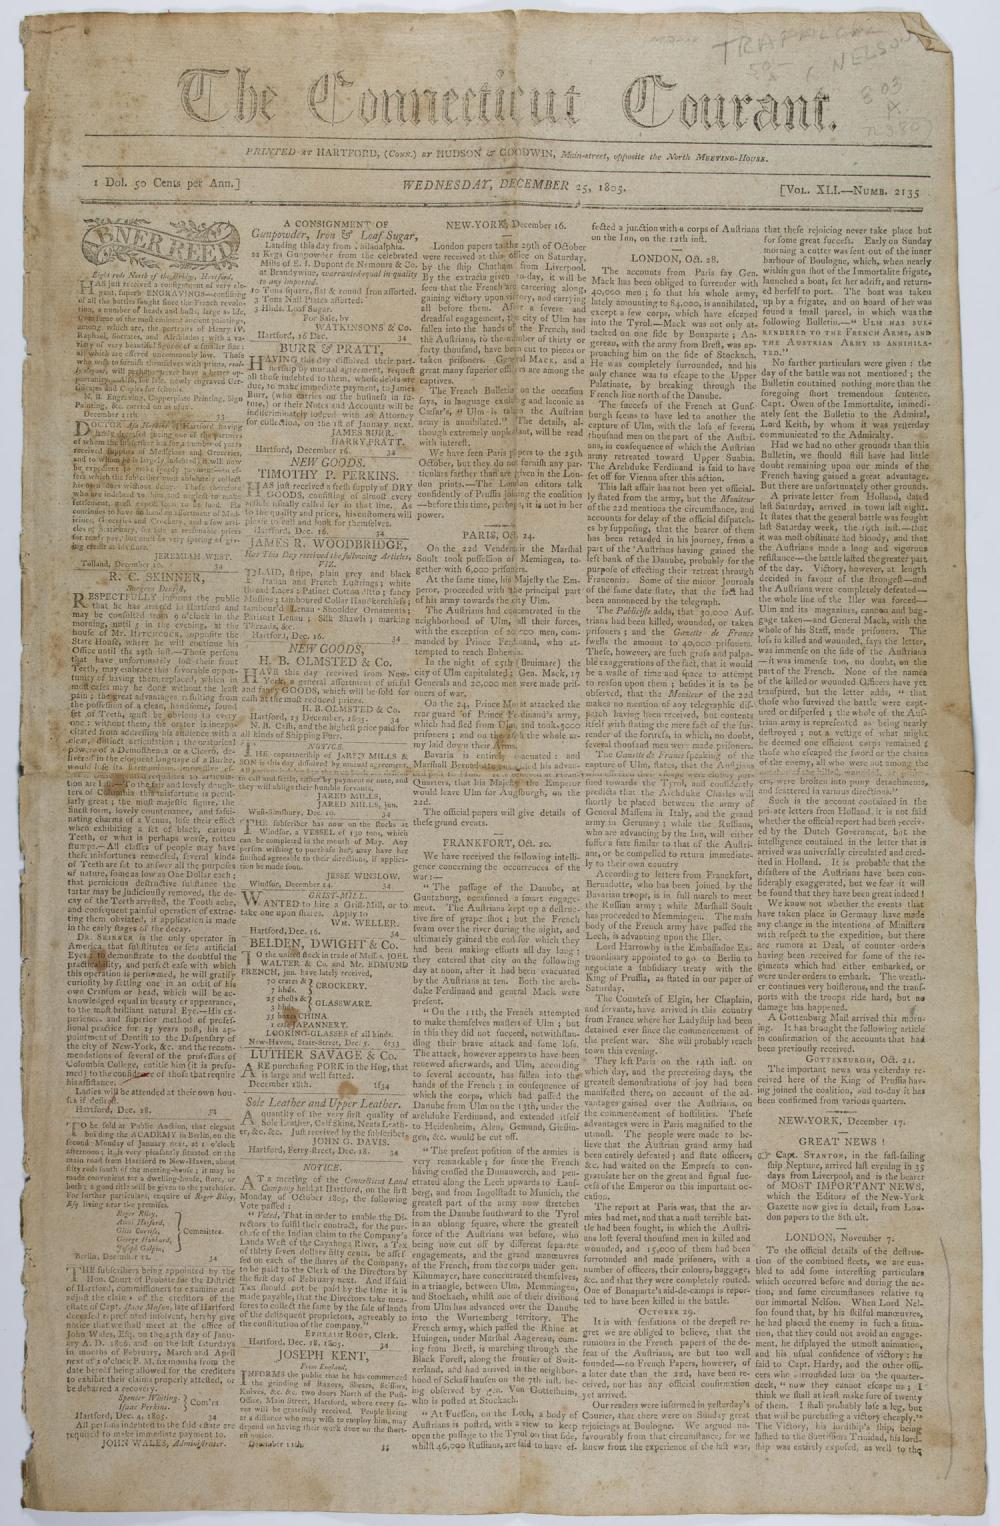 (BATTLE OF TRAFALGAR) DEATH OF ADMIRAL NELSON NEWSPAPER